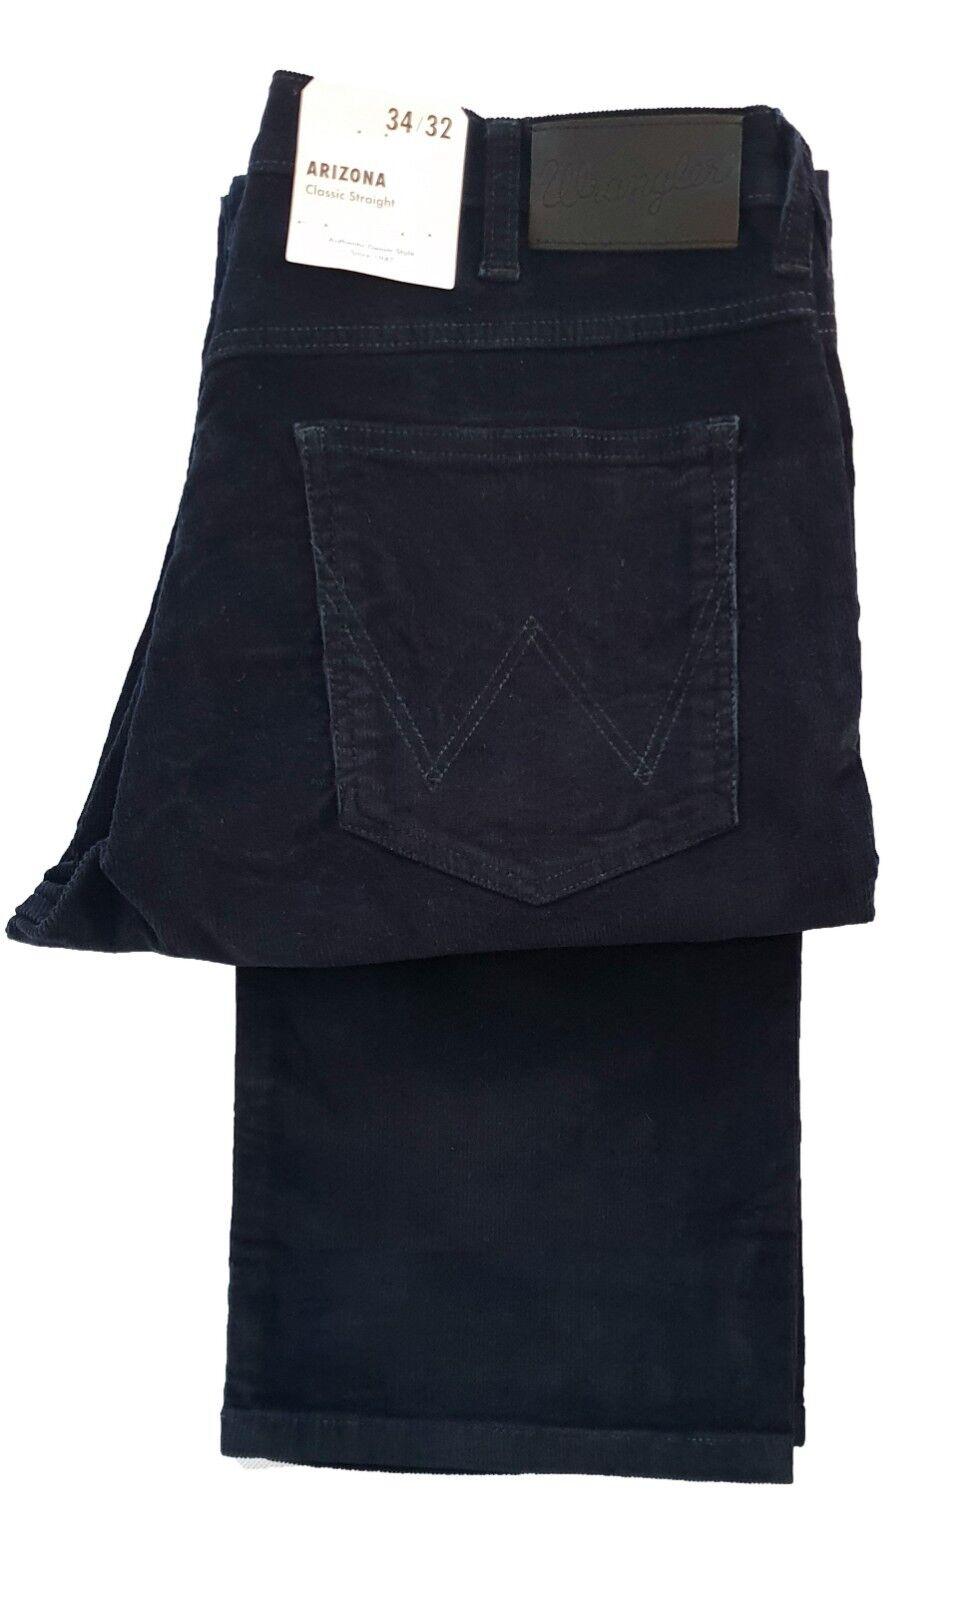 MENS WRANGLER ARIZONA TALL 36 LEG STRAIGHT LEG ZIP FLY CORD JEANS - NAVY blueE